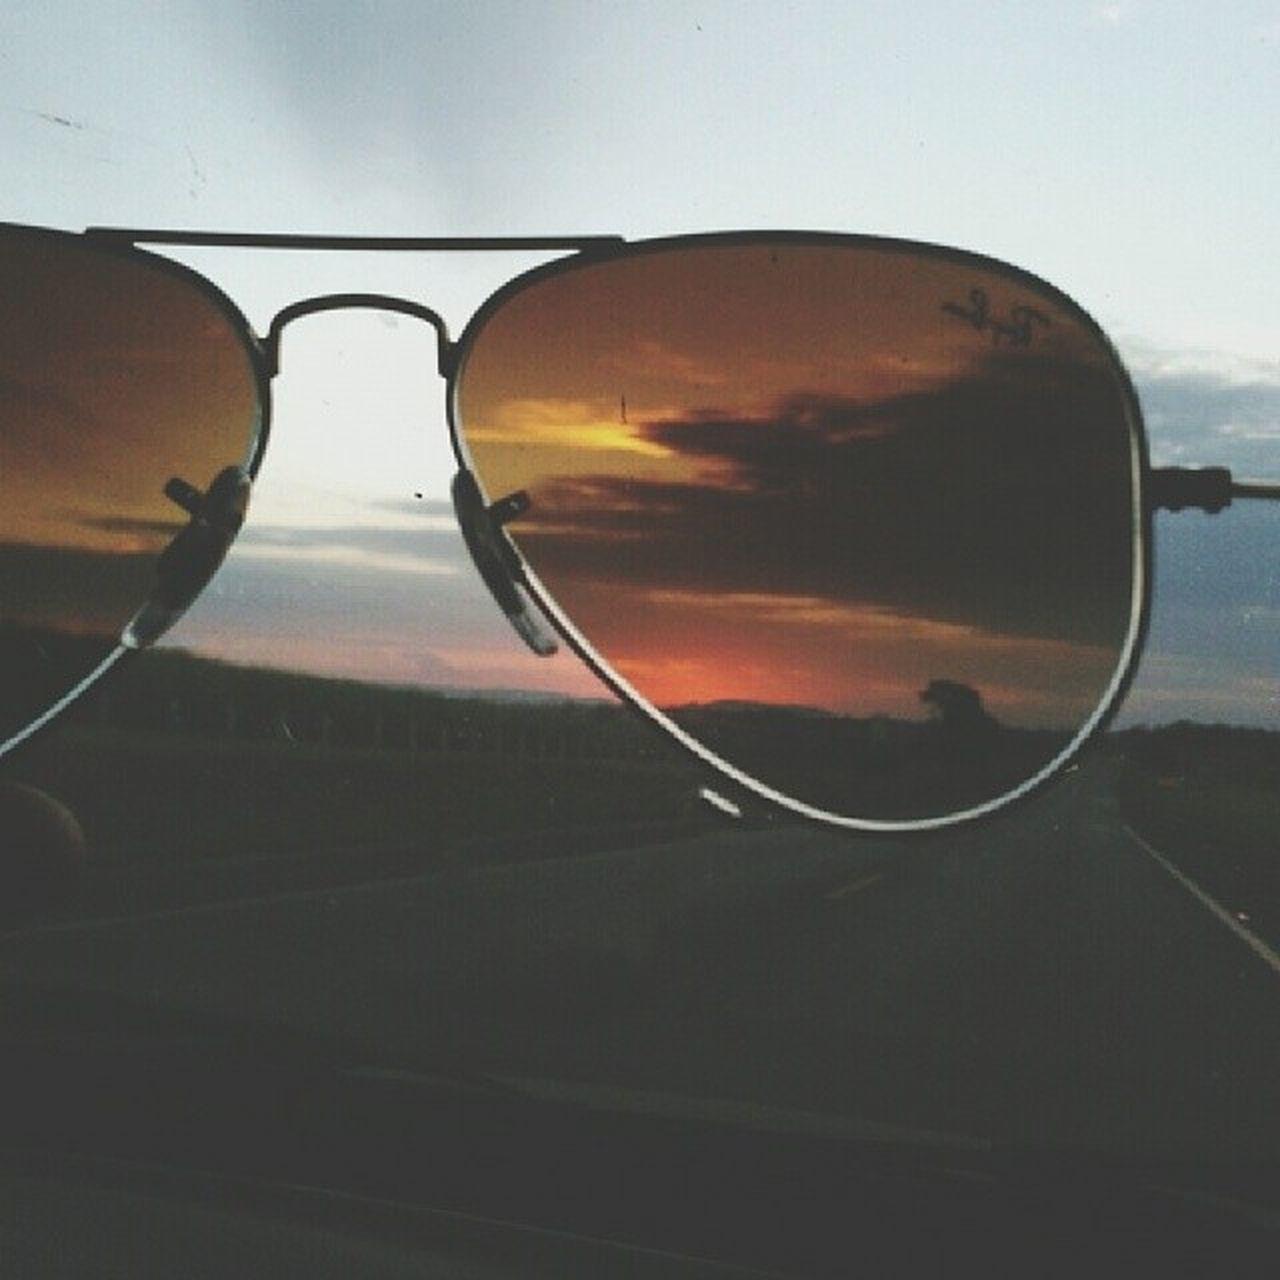 sunglasses, eyeglasses, eyewear, vision, reflection, glasses, sky, eyesight, protection, no people, cool, day, outdoors, nature, close-up